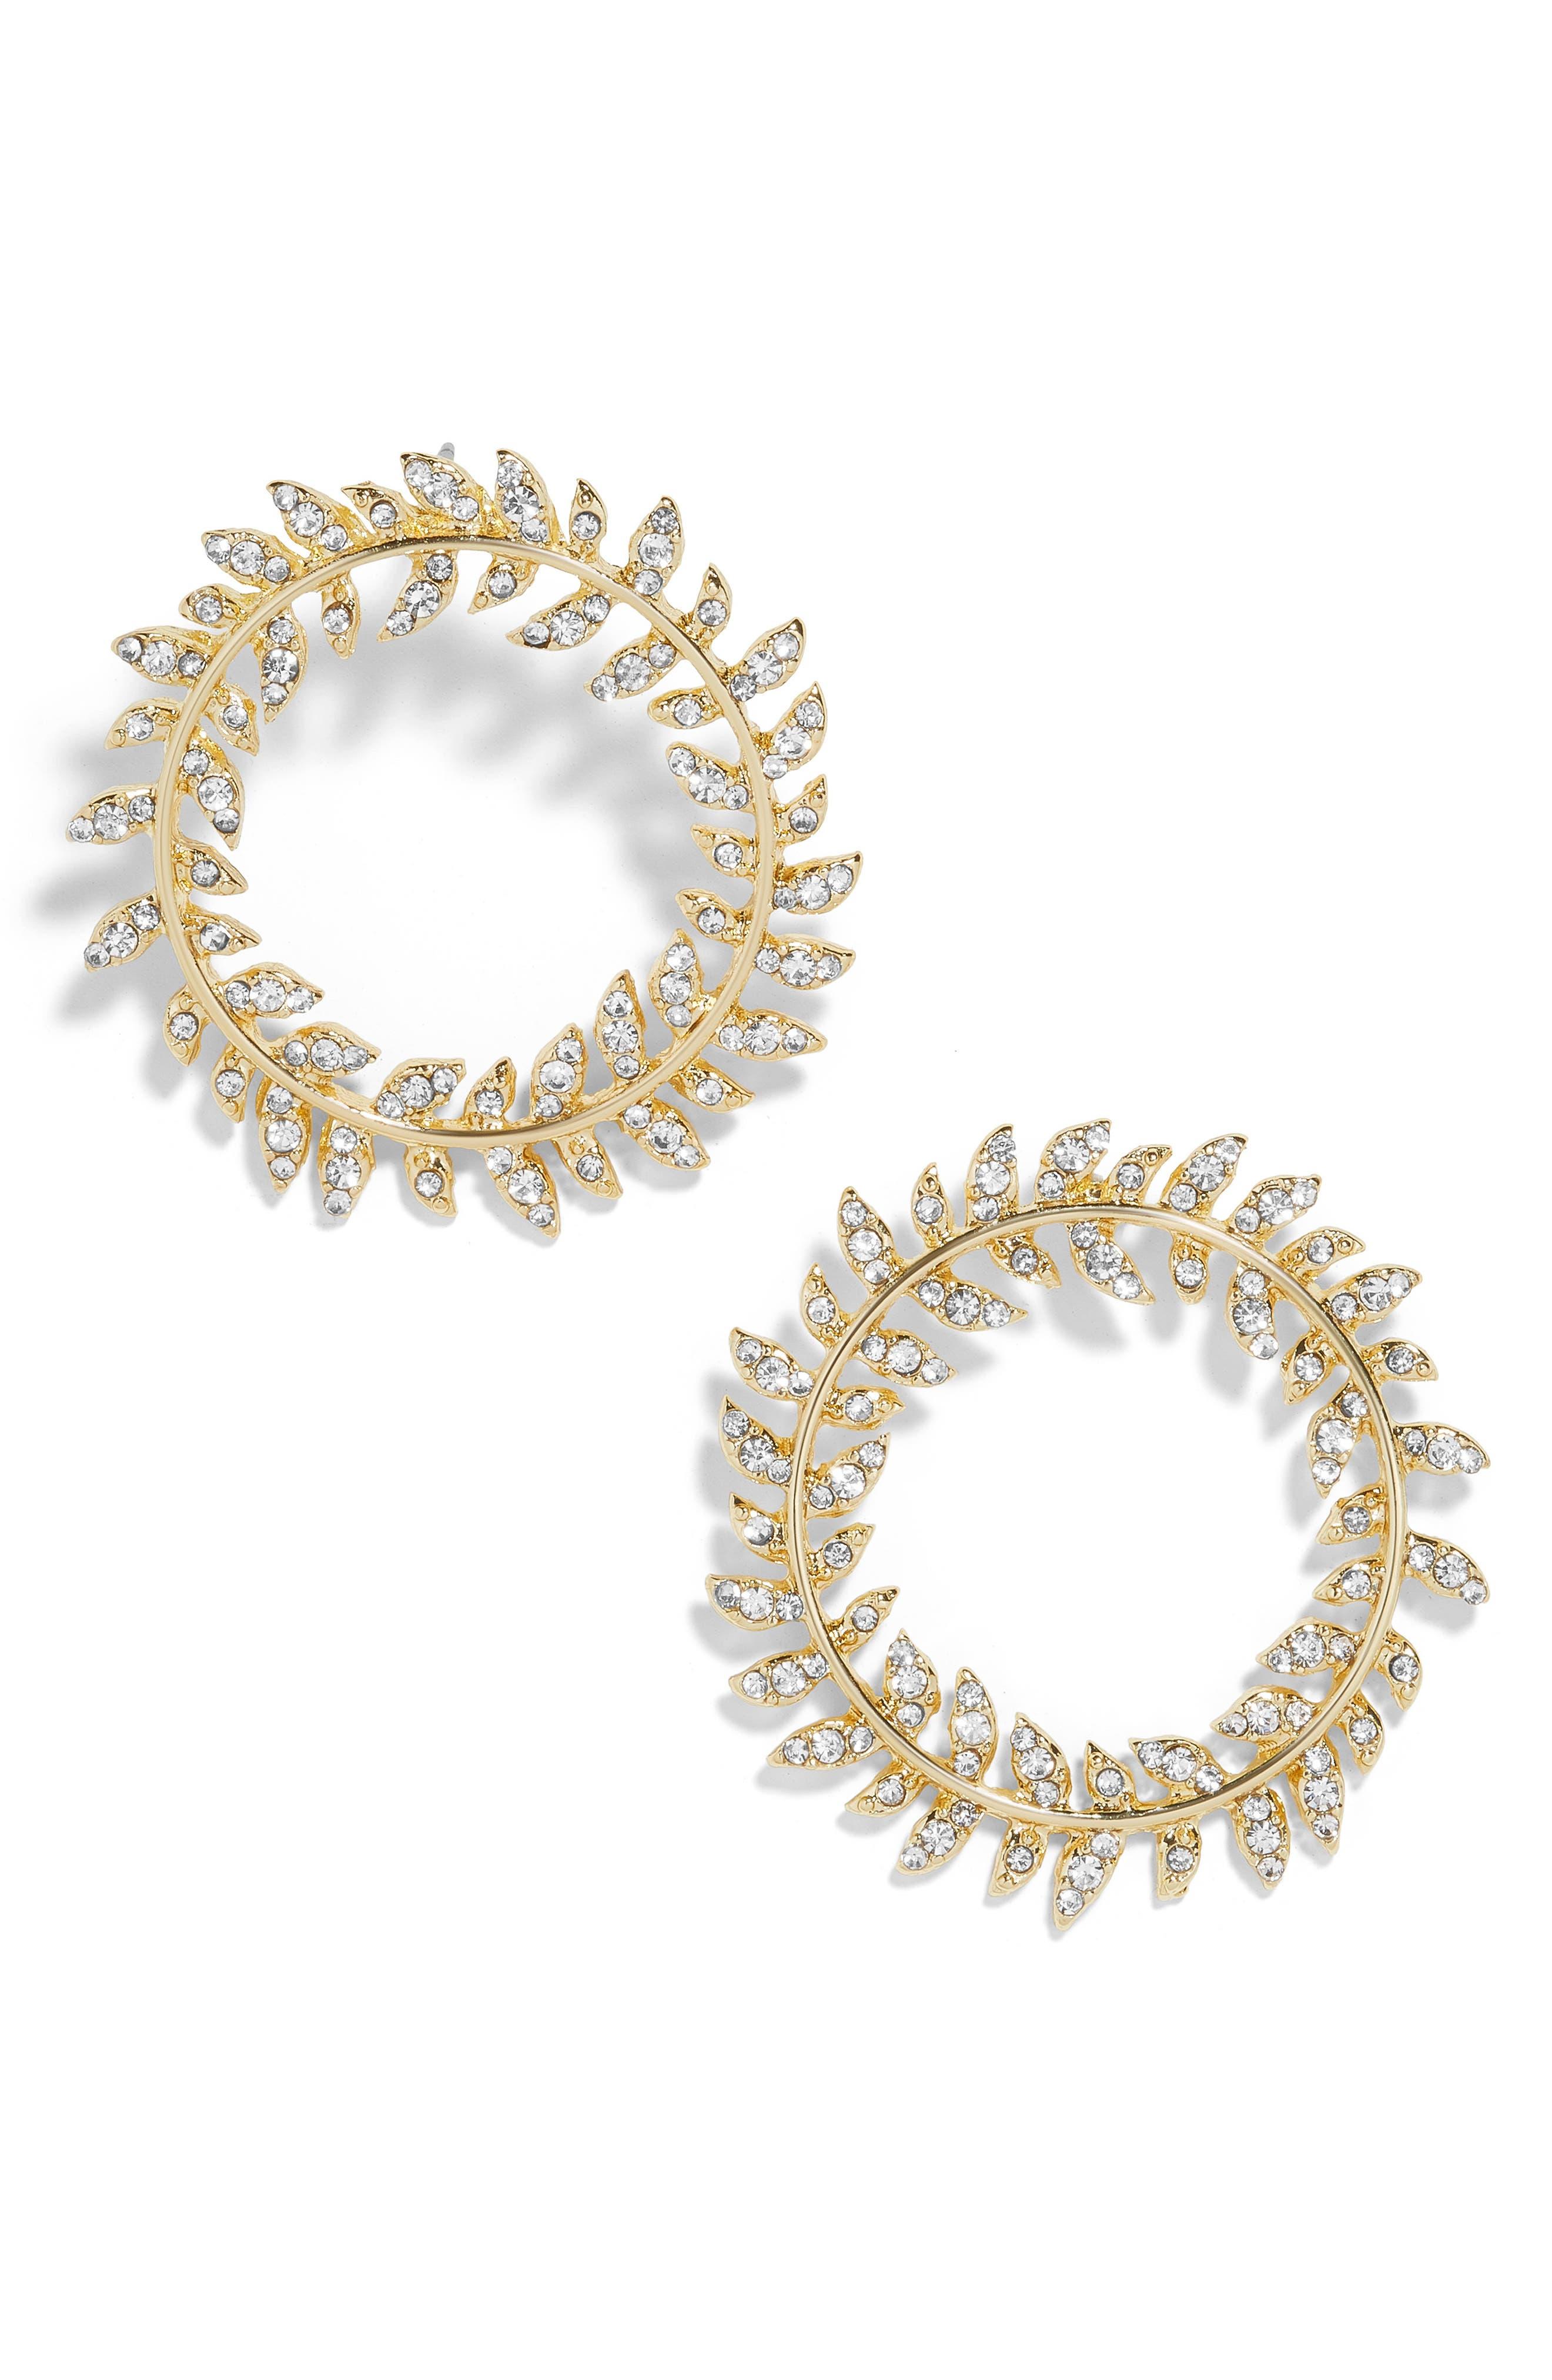 BAUBLEBAR Protea Hoop Earrings, Main, color, GOLD